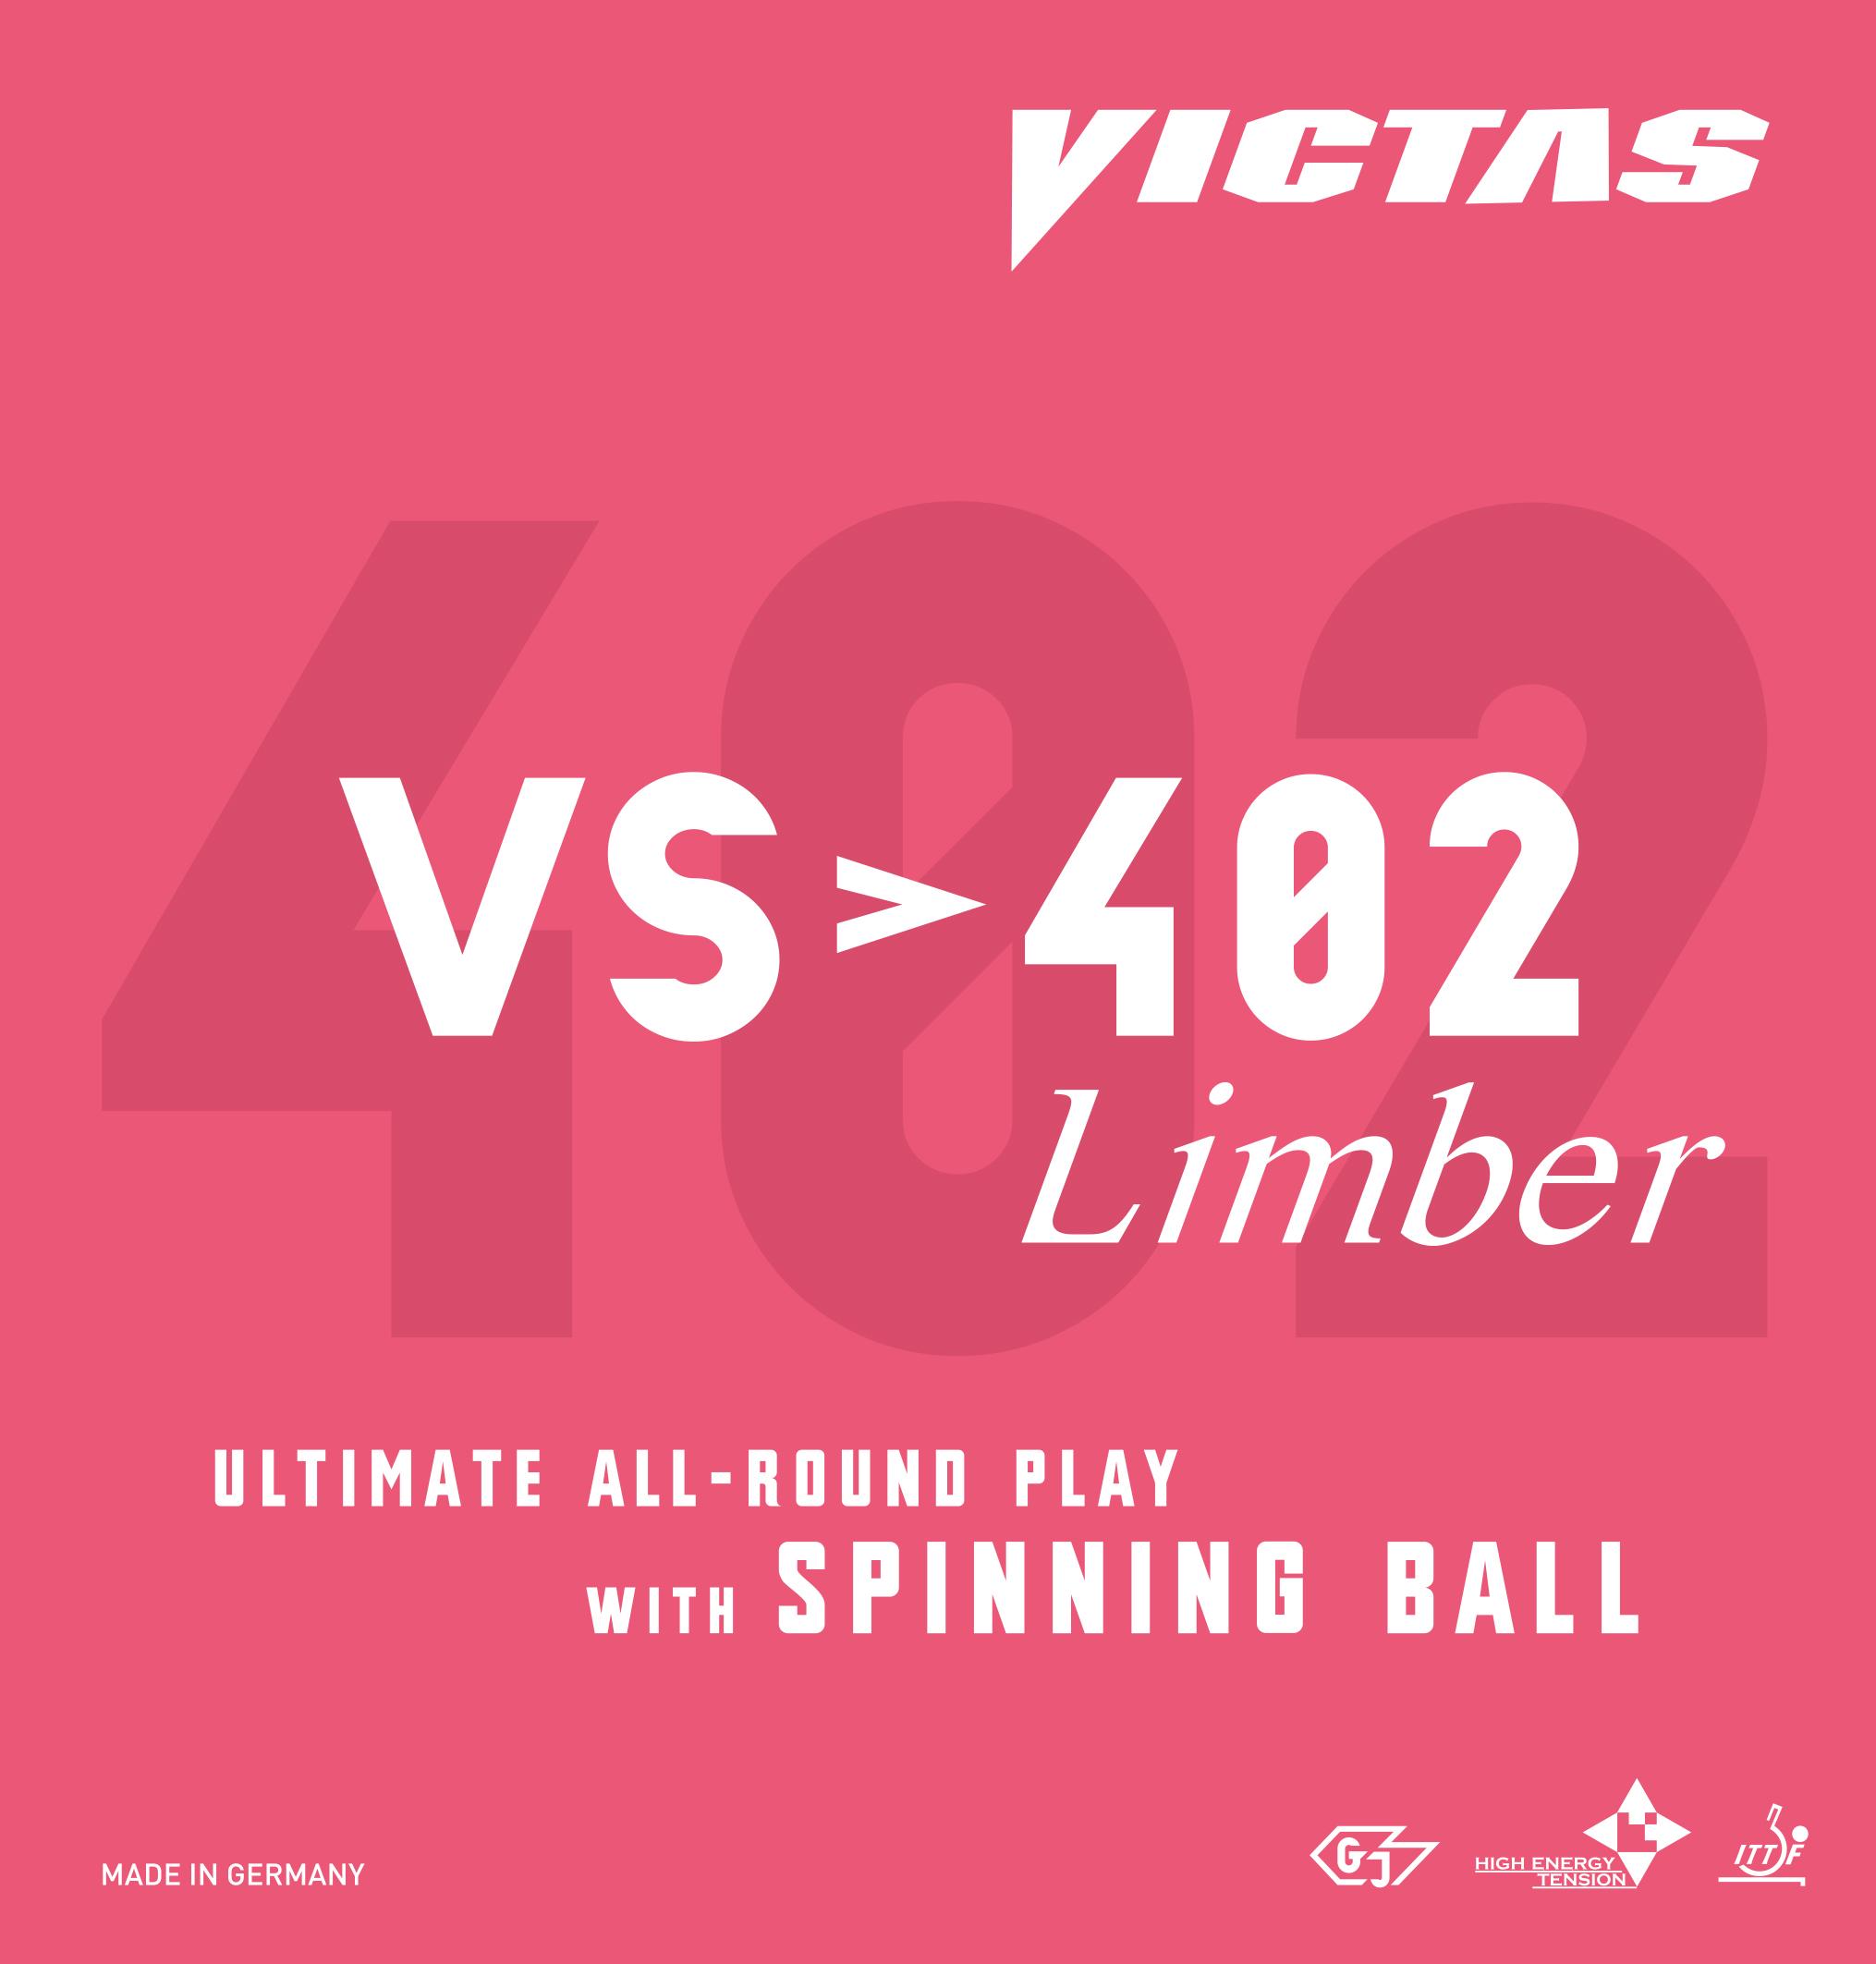 Victas Vs Gt 402 Limber Table Tennis Rubber Bribar Table Tennis